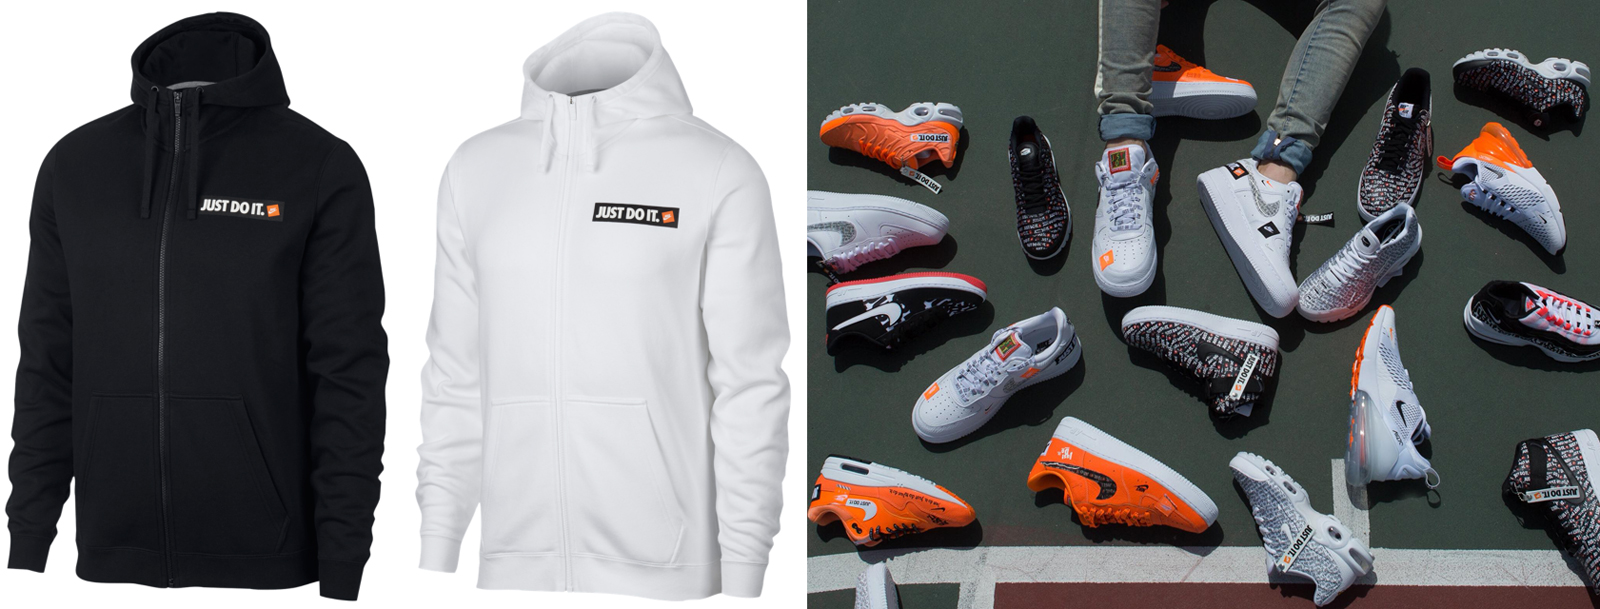 nike-jdi-just-do-it-logo-zip-hoodies